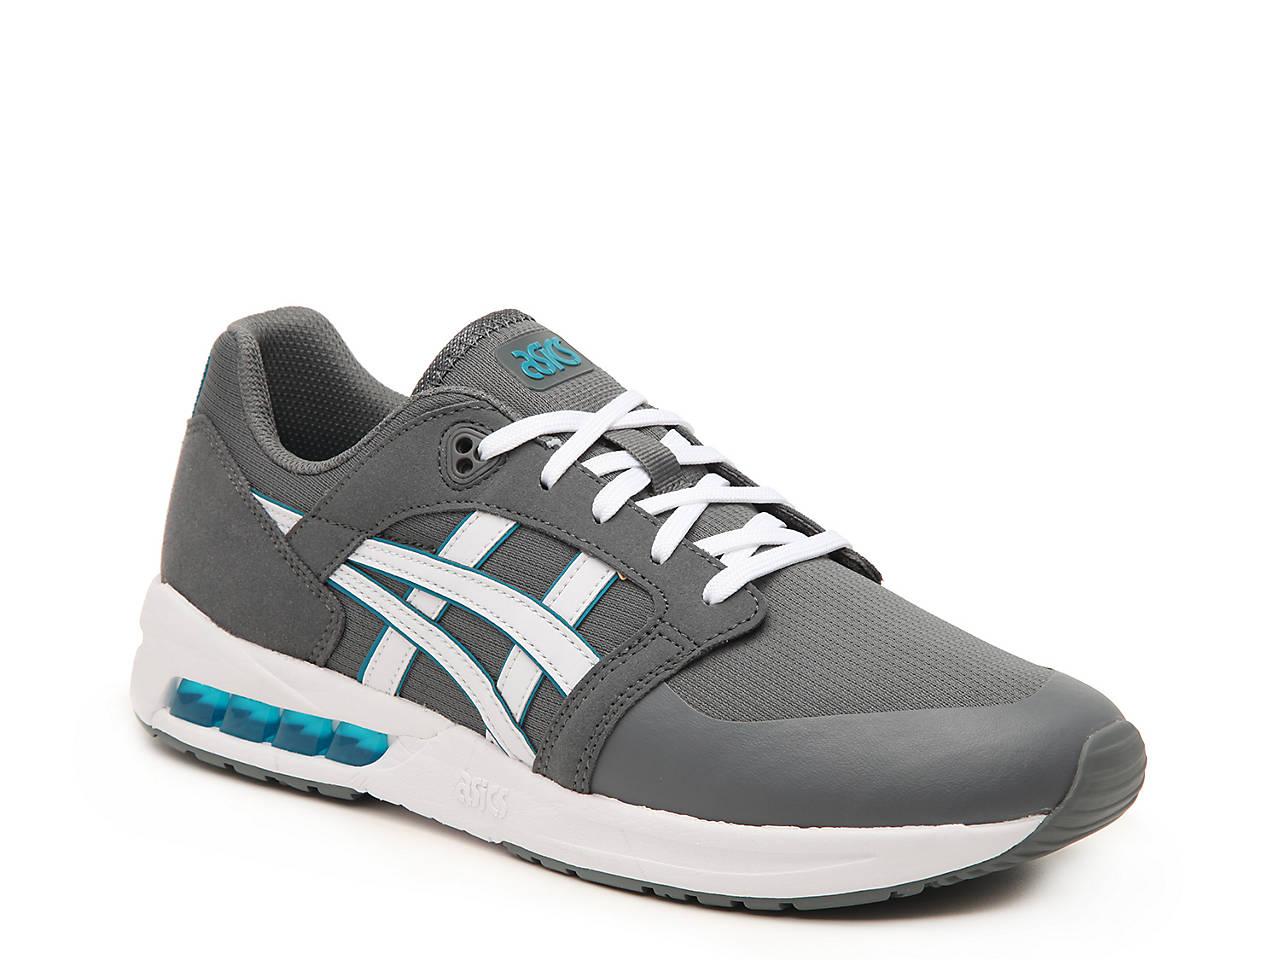 promo code 50b1c e509b Gelsaga Sou Sneaker - Men's